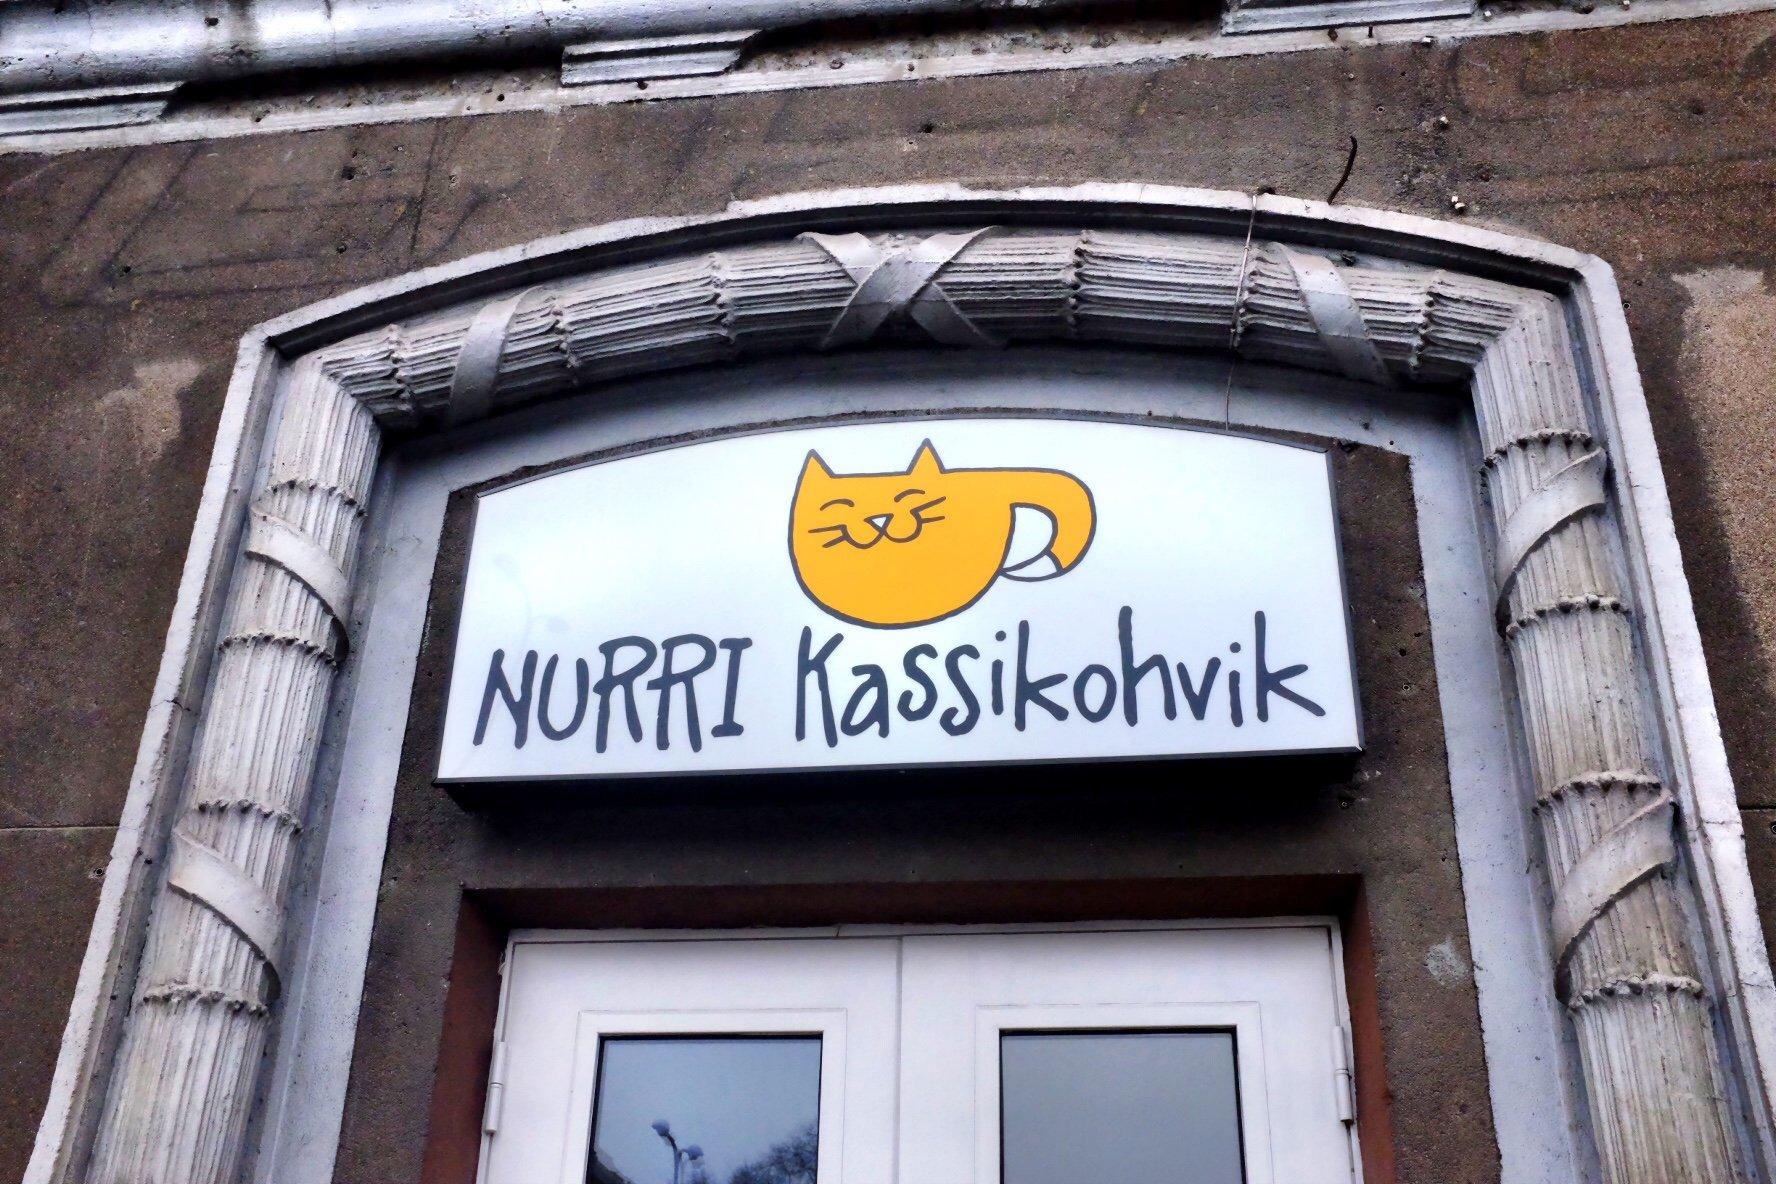 Nurri Kassikohvik outside in Tallinn